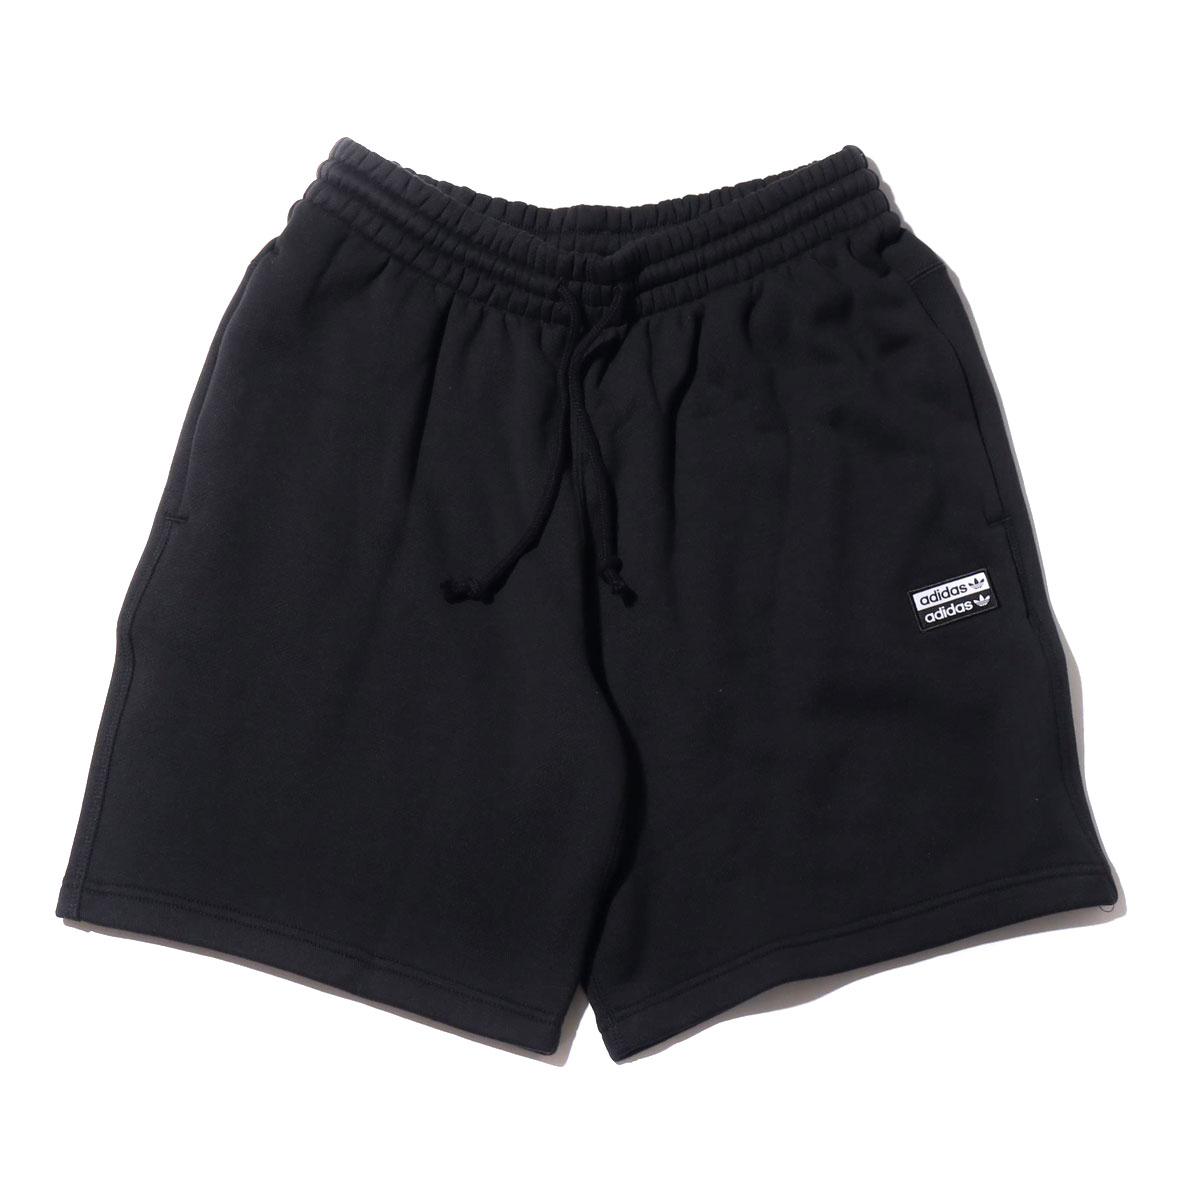 adidas R.Y.V. SHORTS(アディダス R.Y.V. ショーツ)BLACK【メンズ パンツ】19SS-I